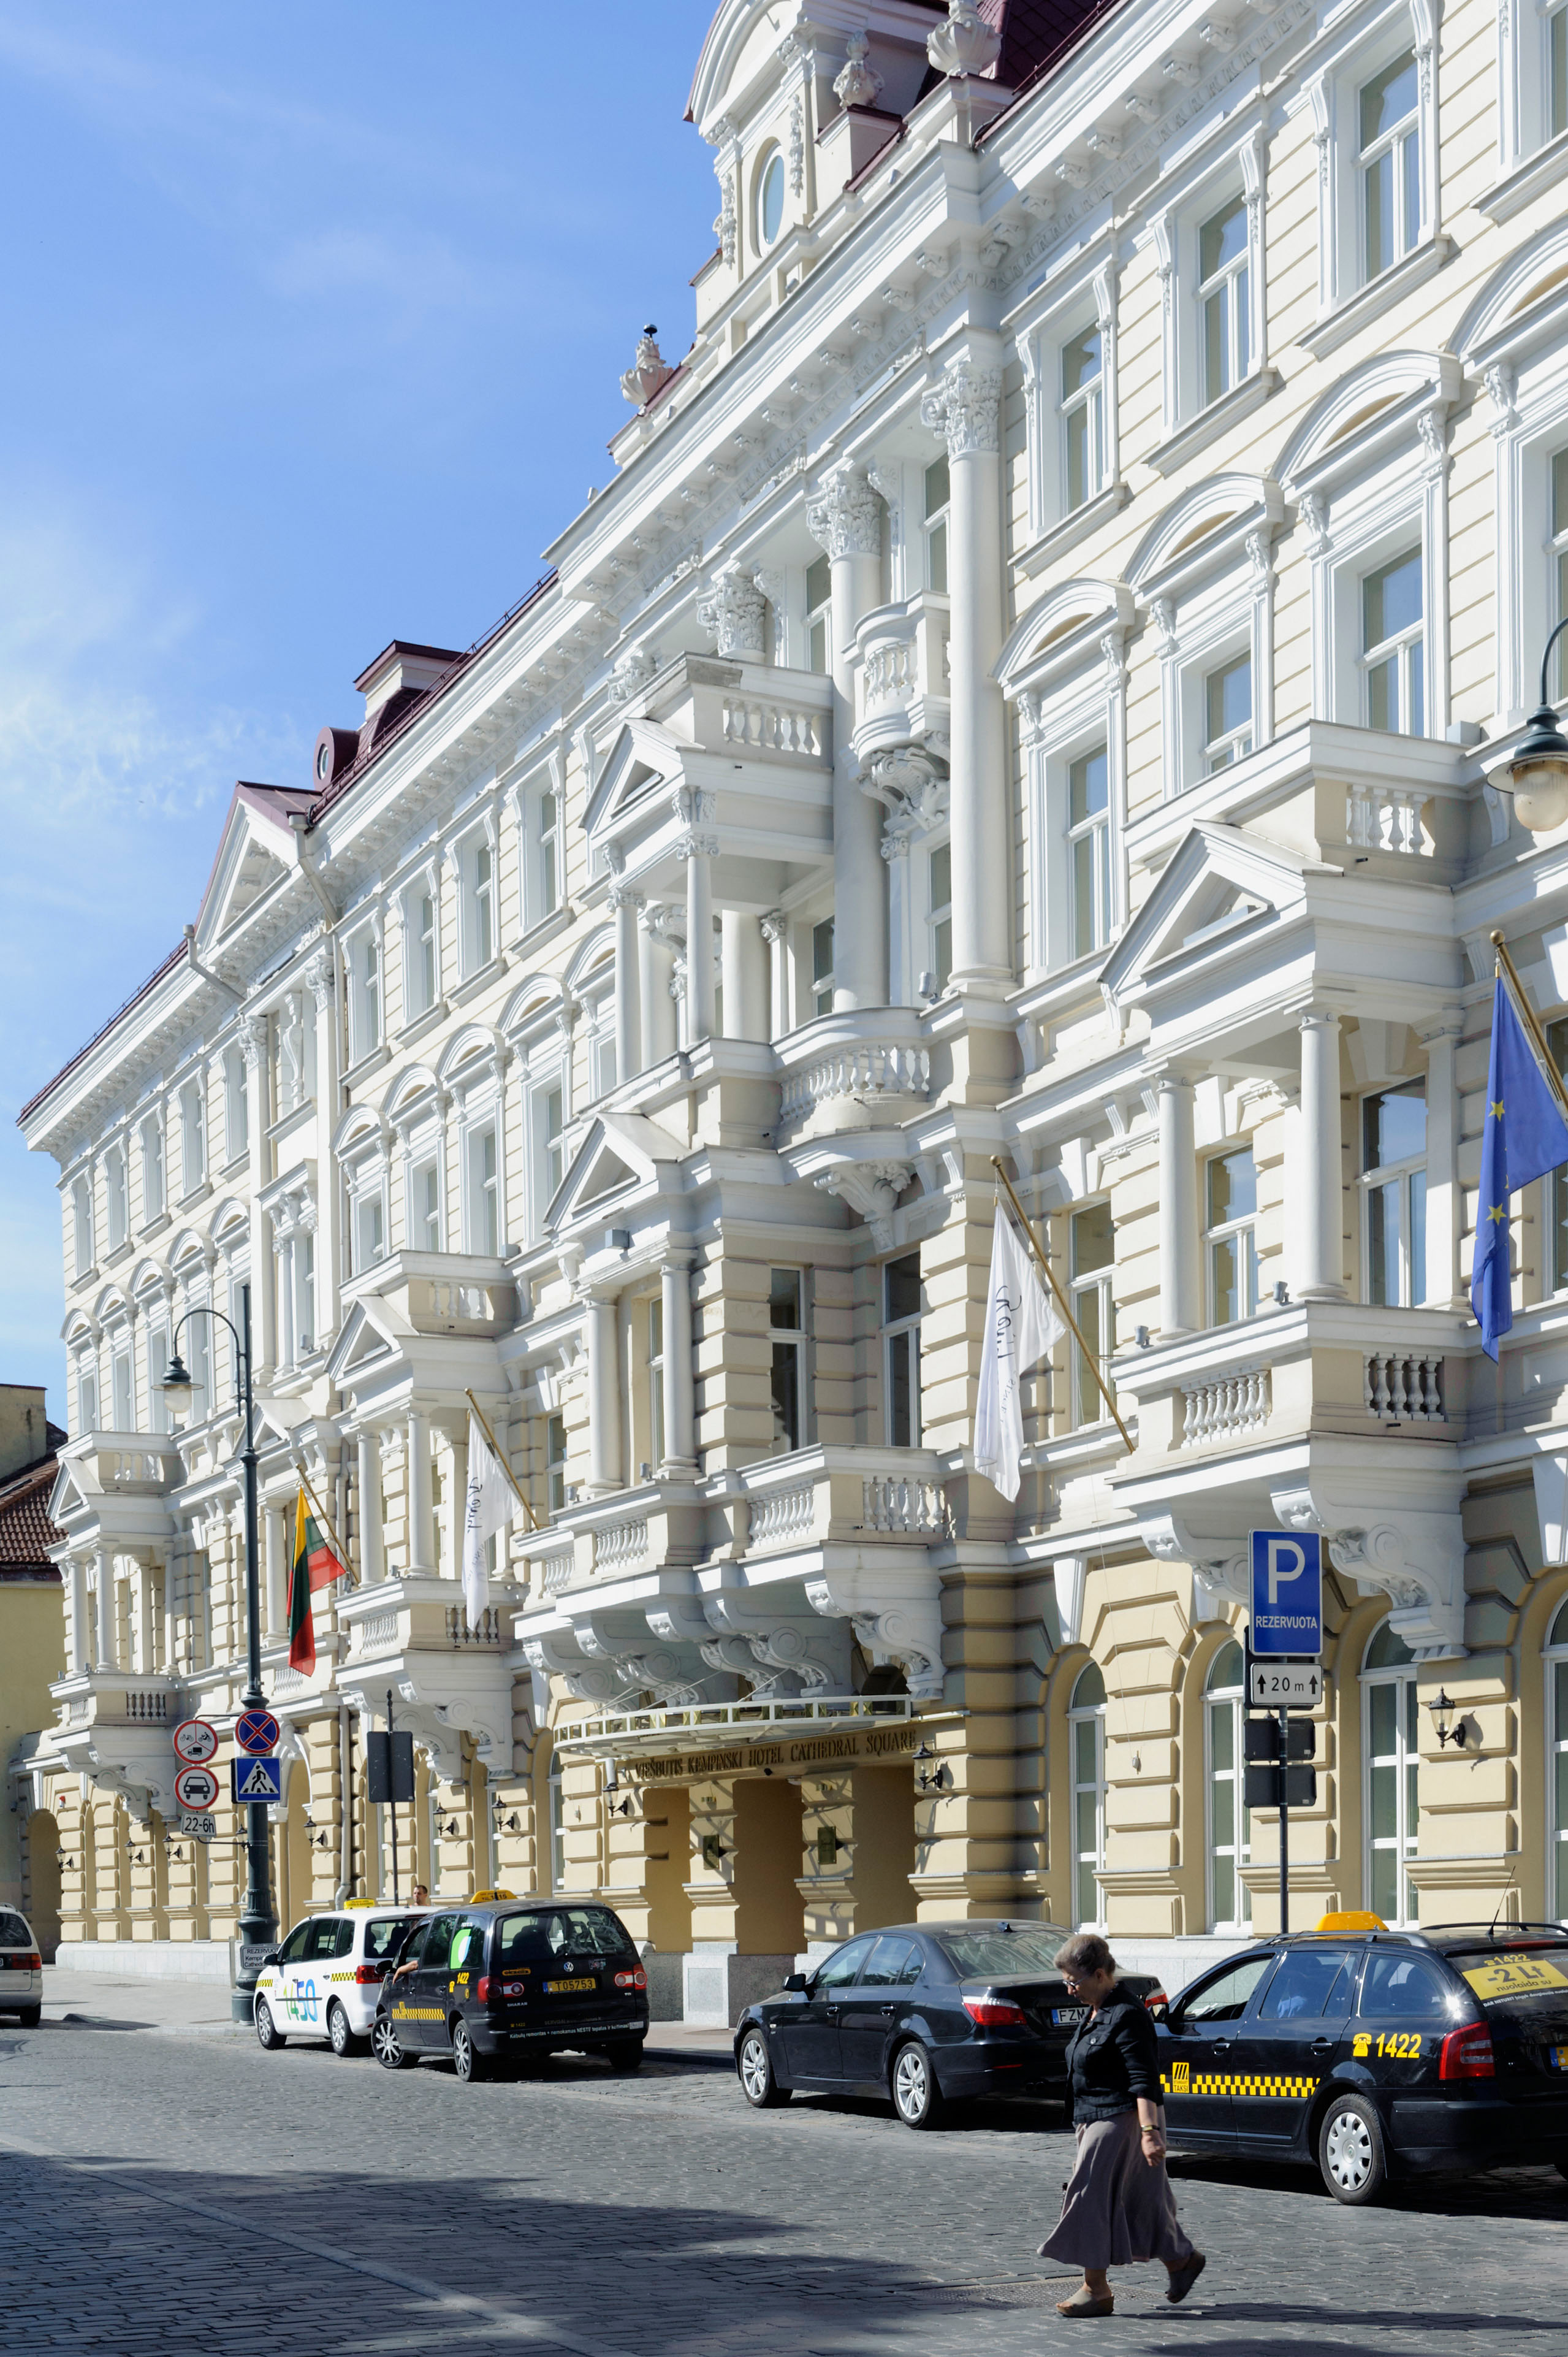 Kempinski-Hotel in Vilnius, Litauen, Europa, Unesco-Weltkulturerbe. Image shot 2013. Exact date unknown.